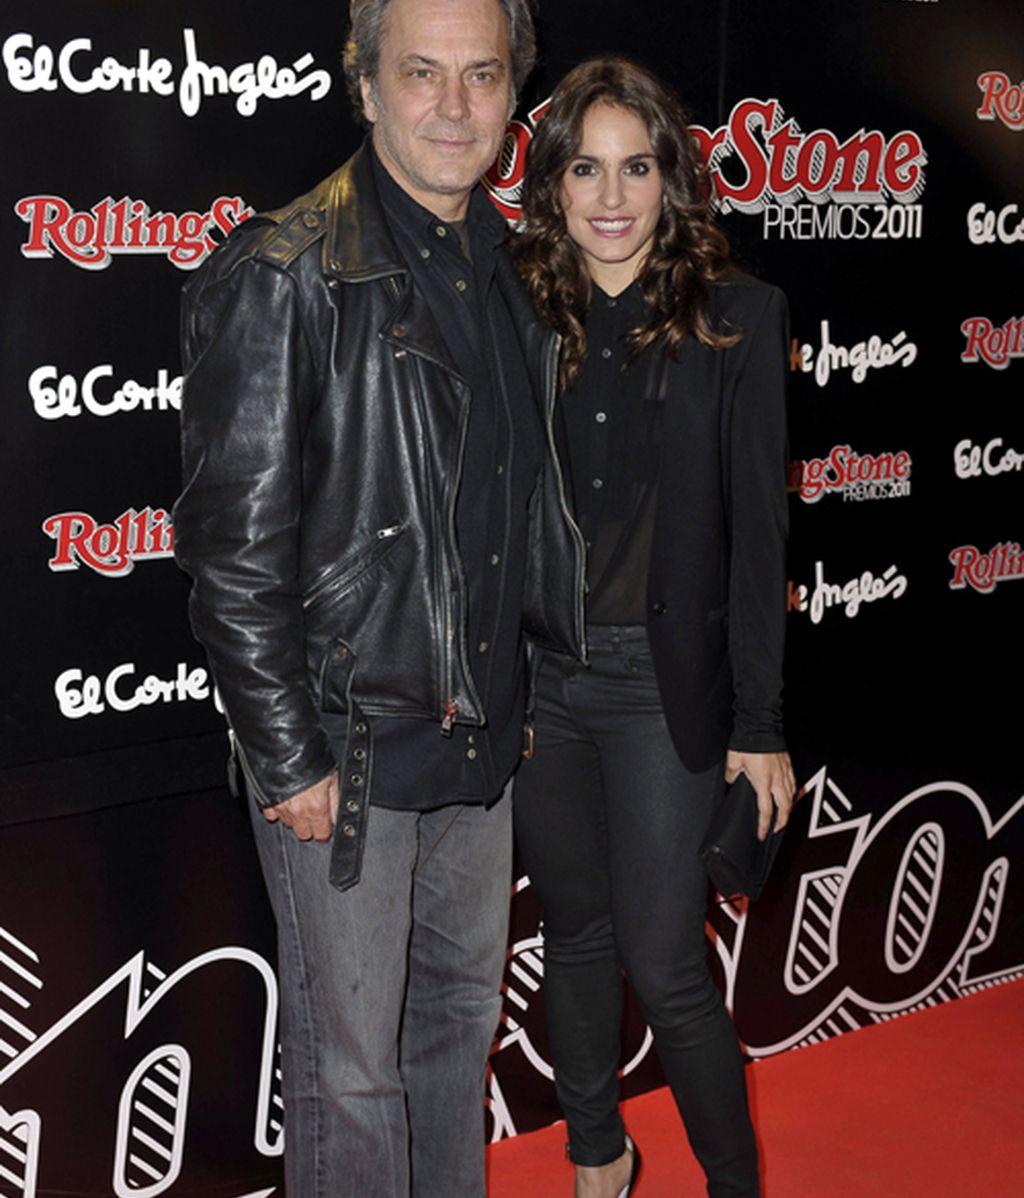 Rolling Stone gala